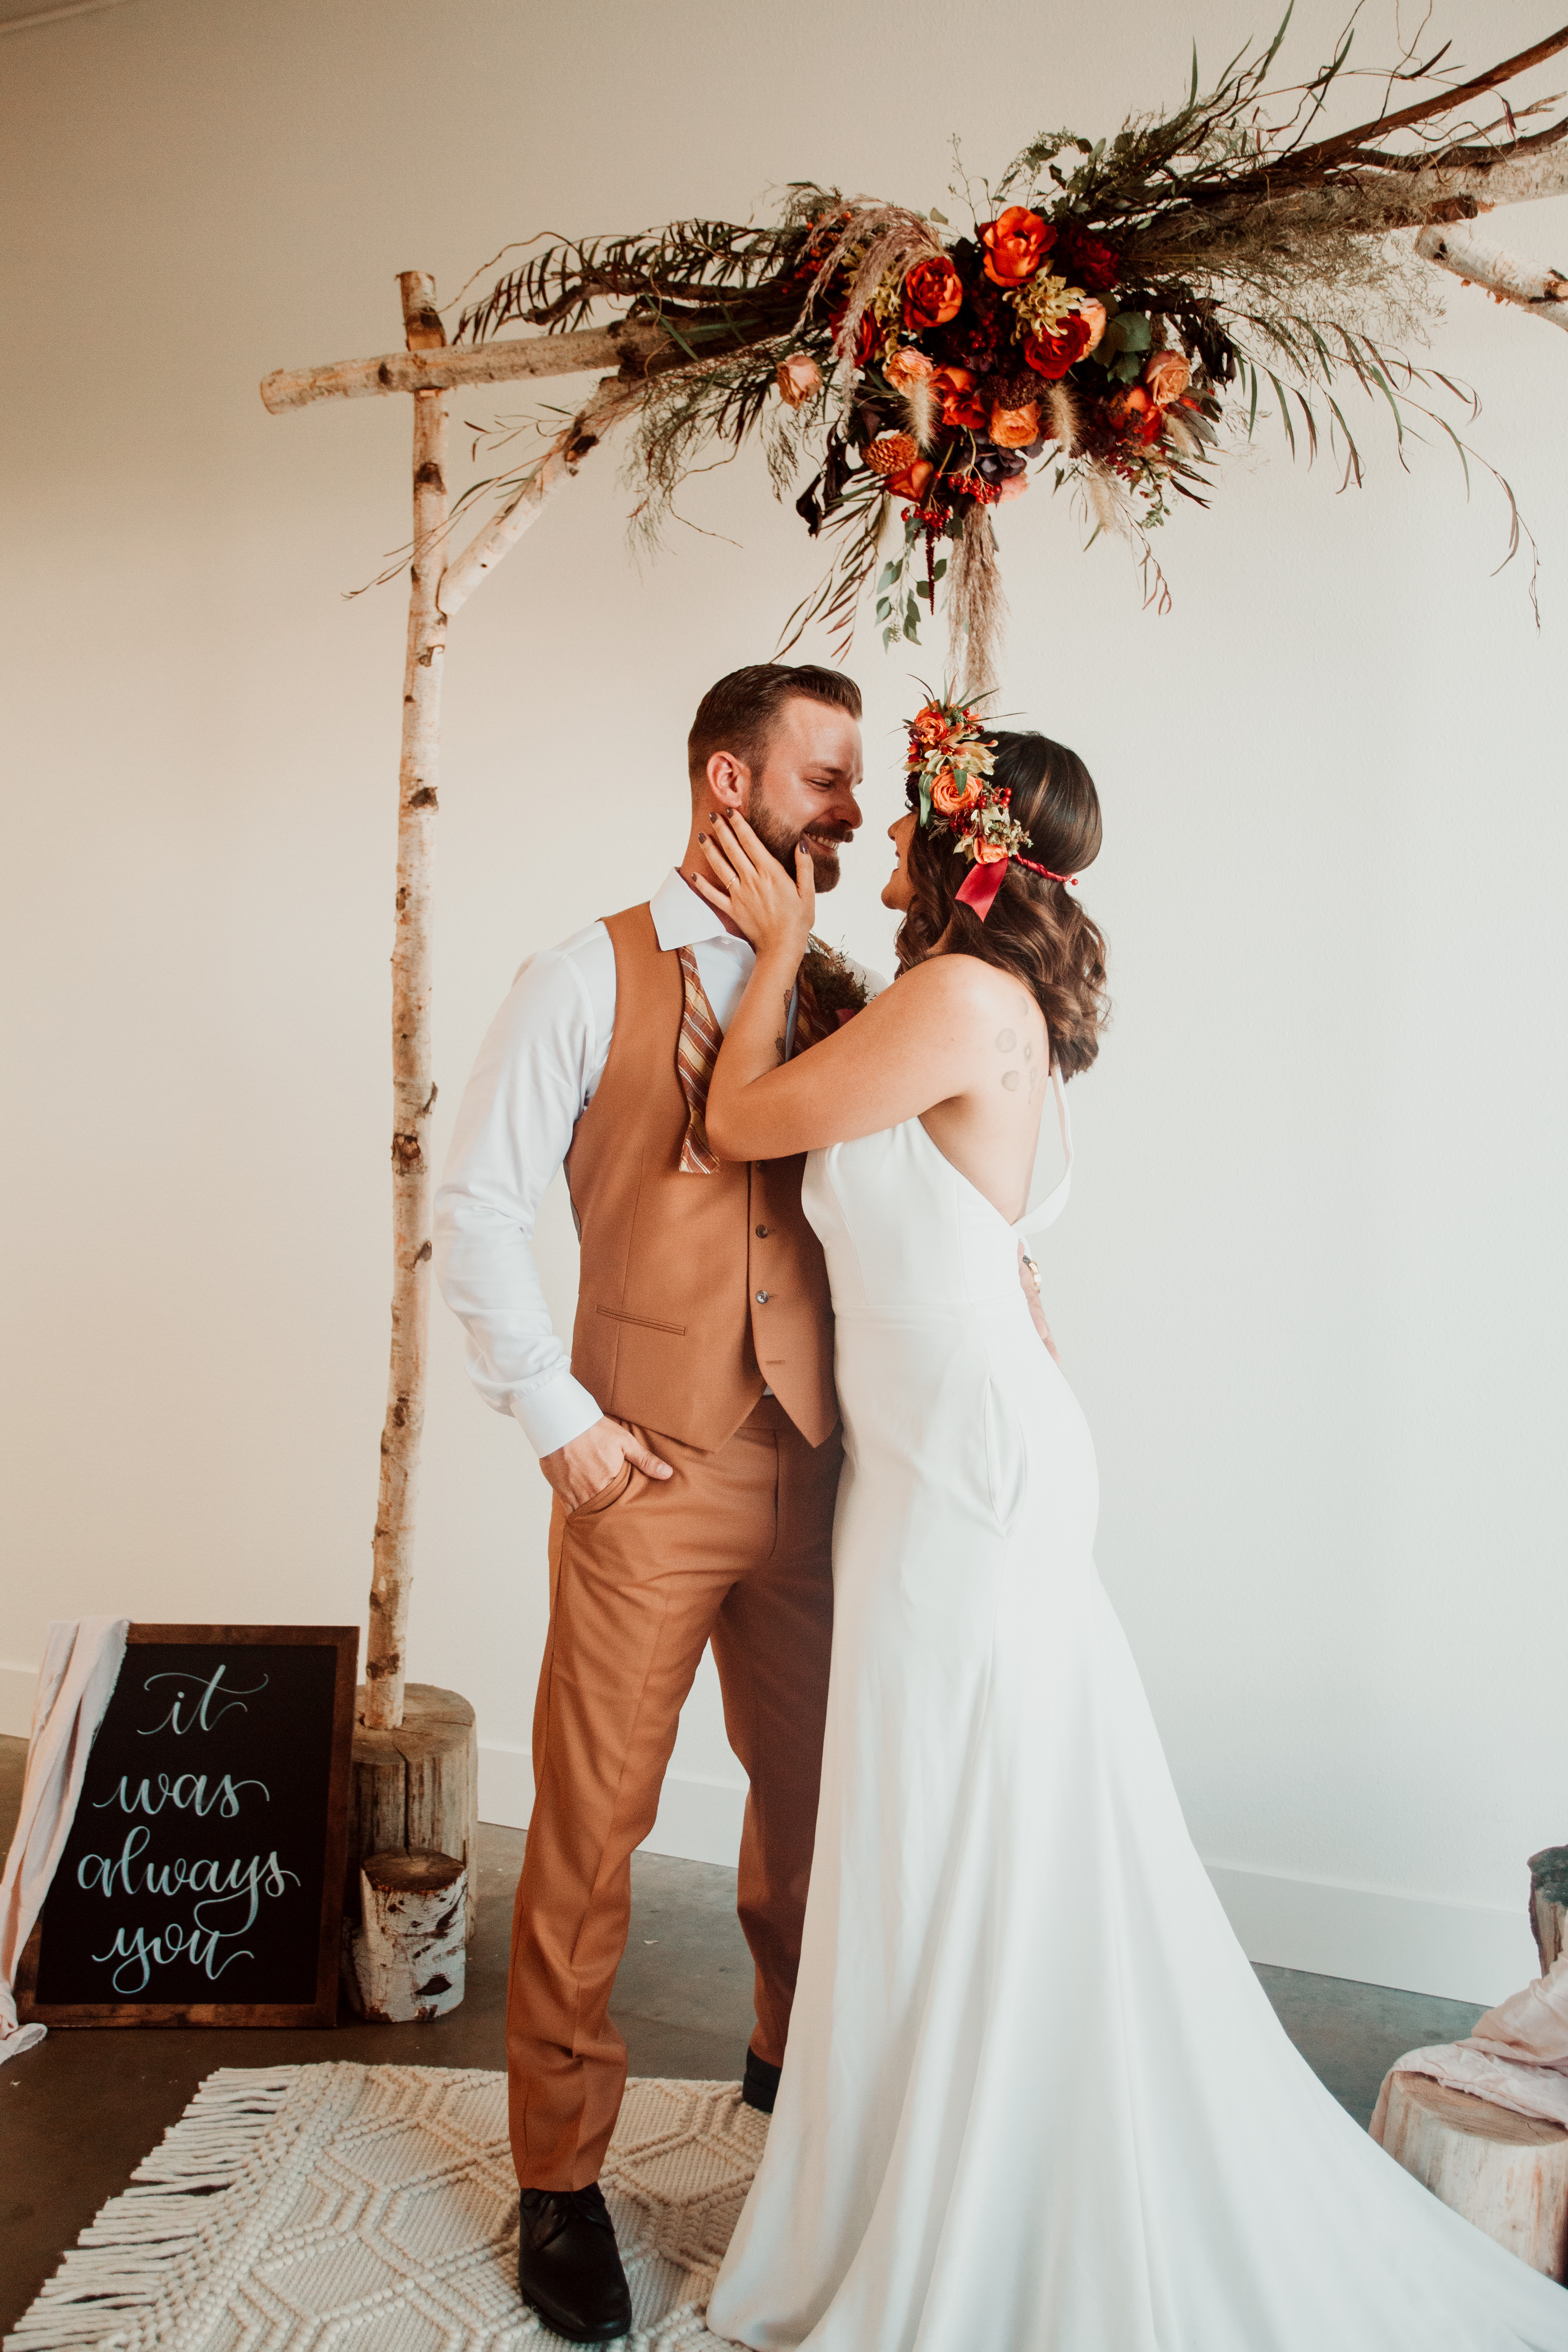 Weddings + Elopements + Engagements